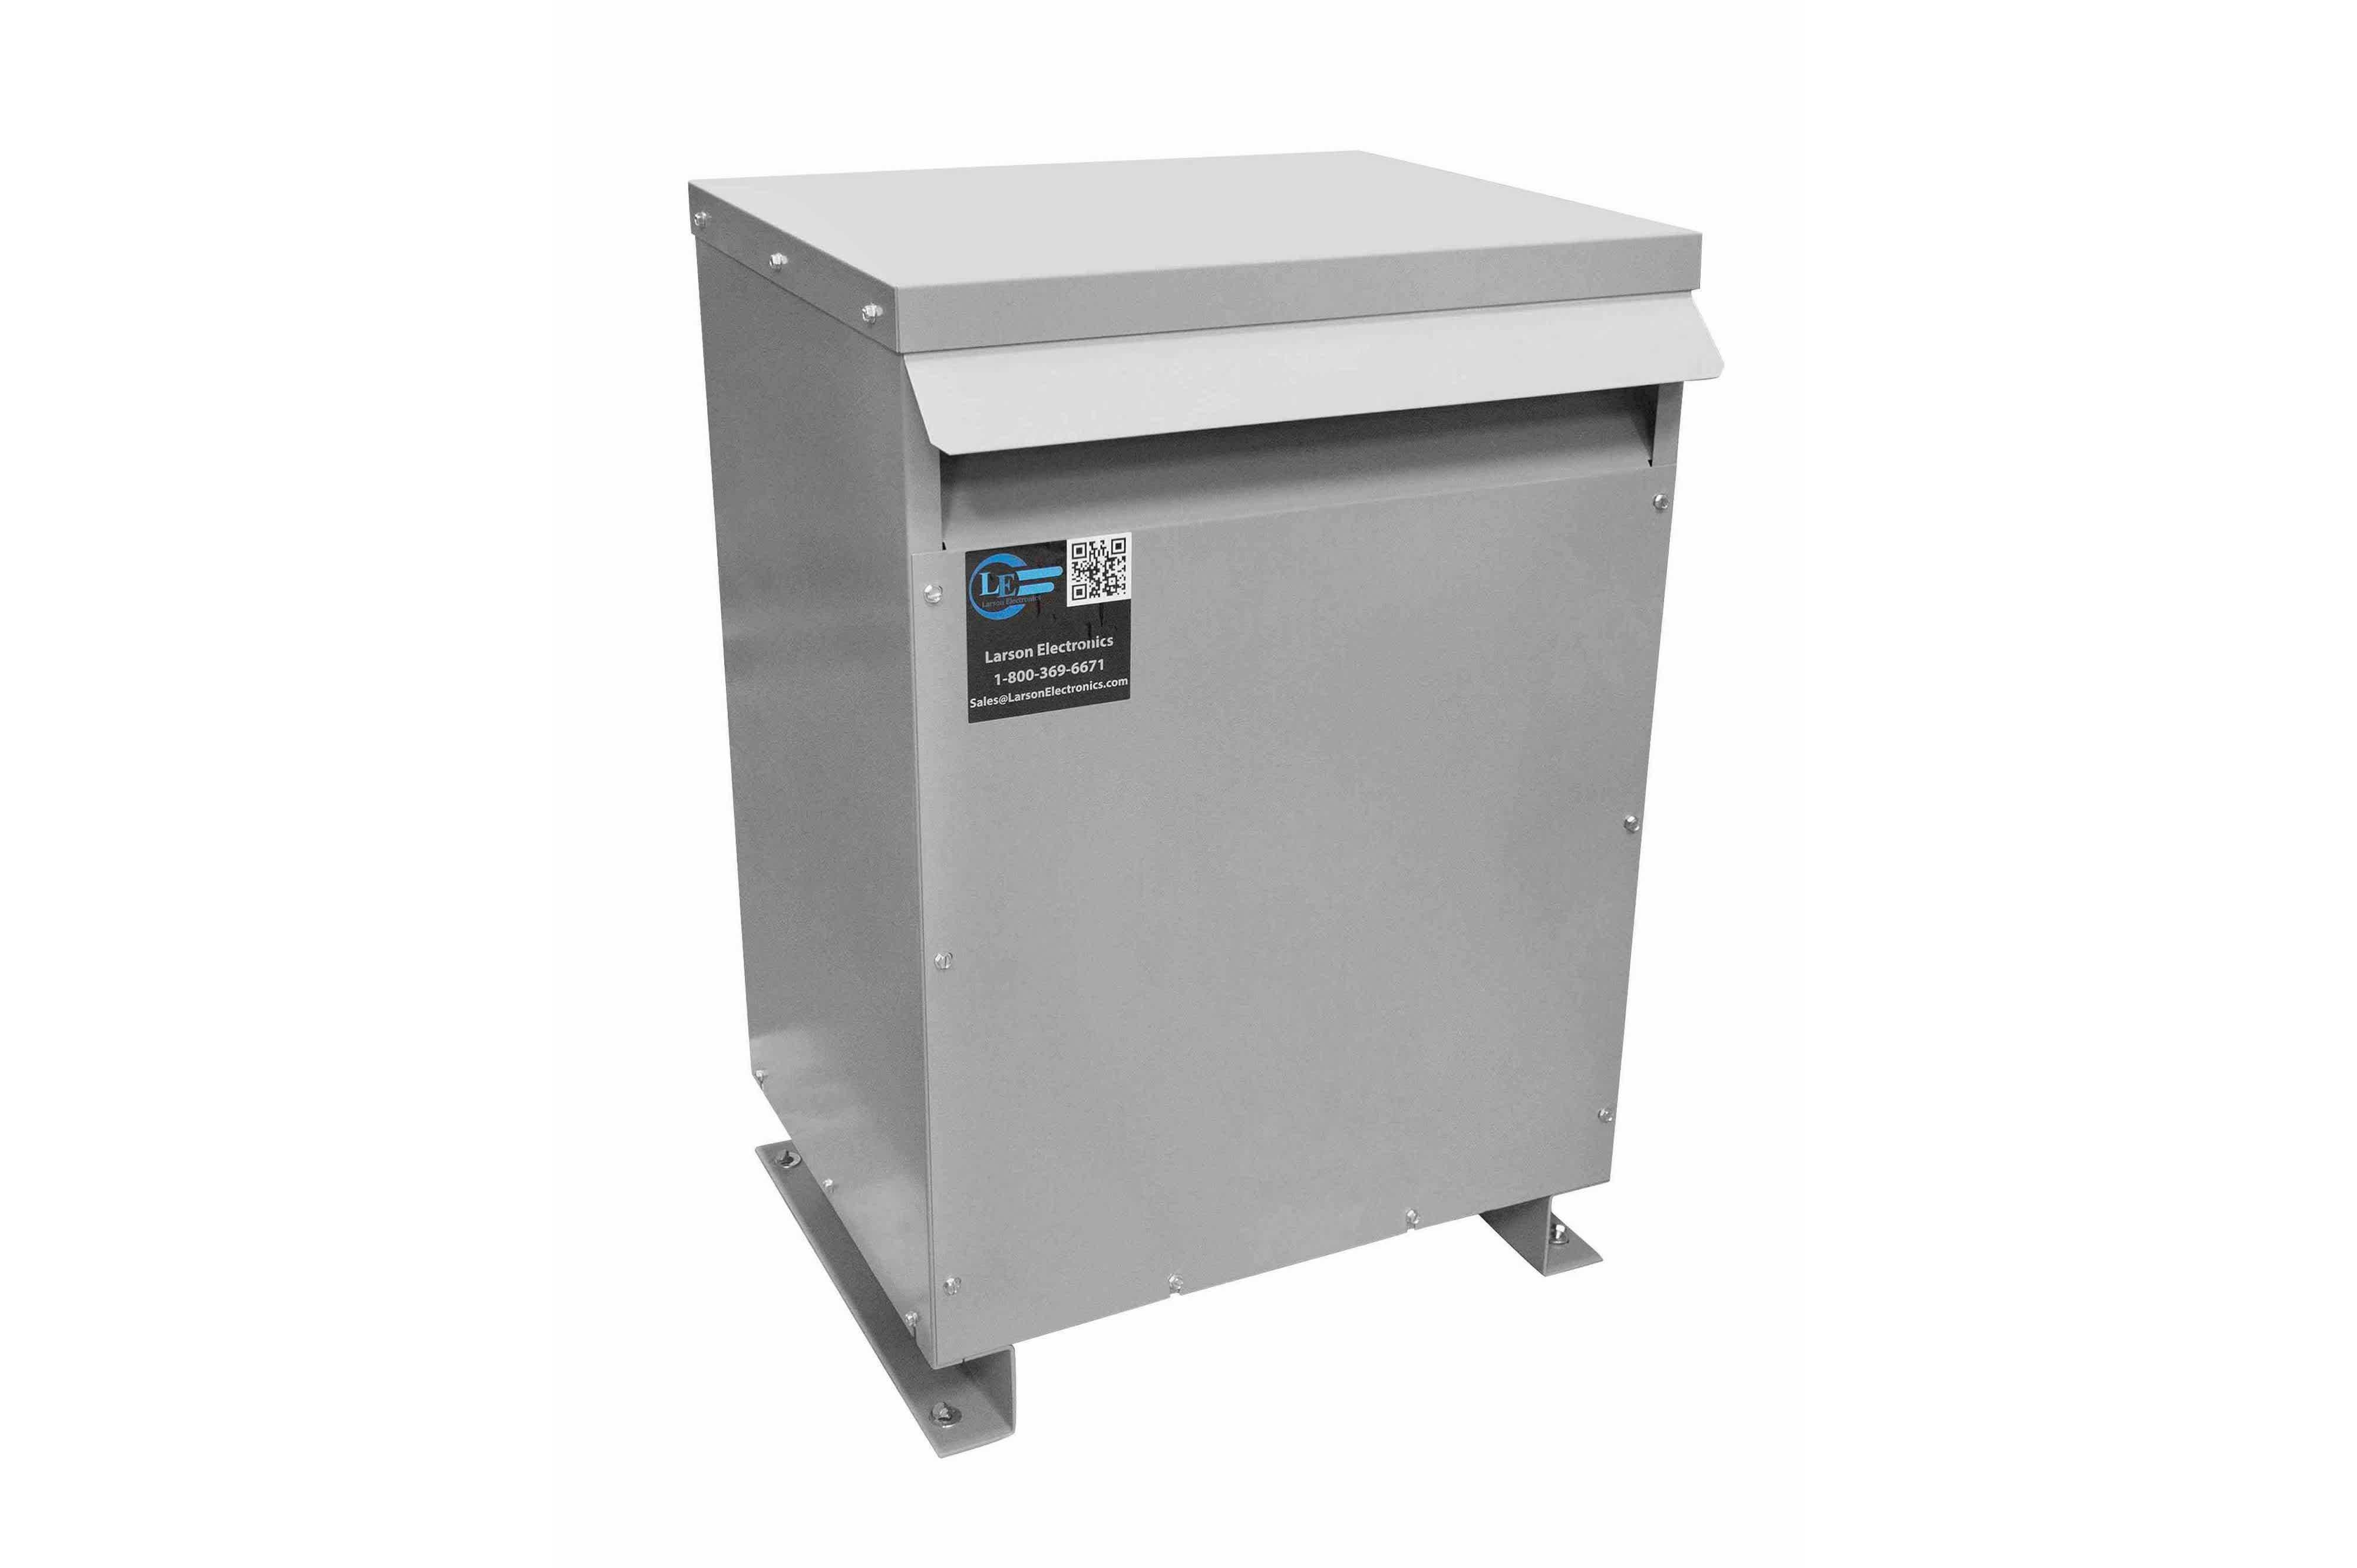 237.5 kVA 3PH Isolation Transformer, 240V Wye Primary, 208V Delta Secondary, N3R, Ventilated, 60 Hz